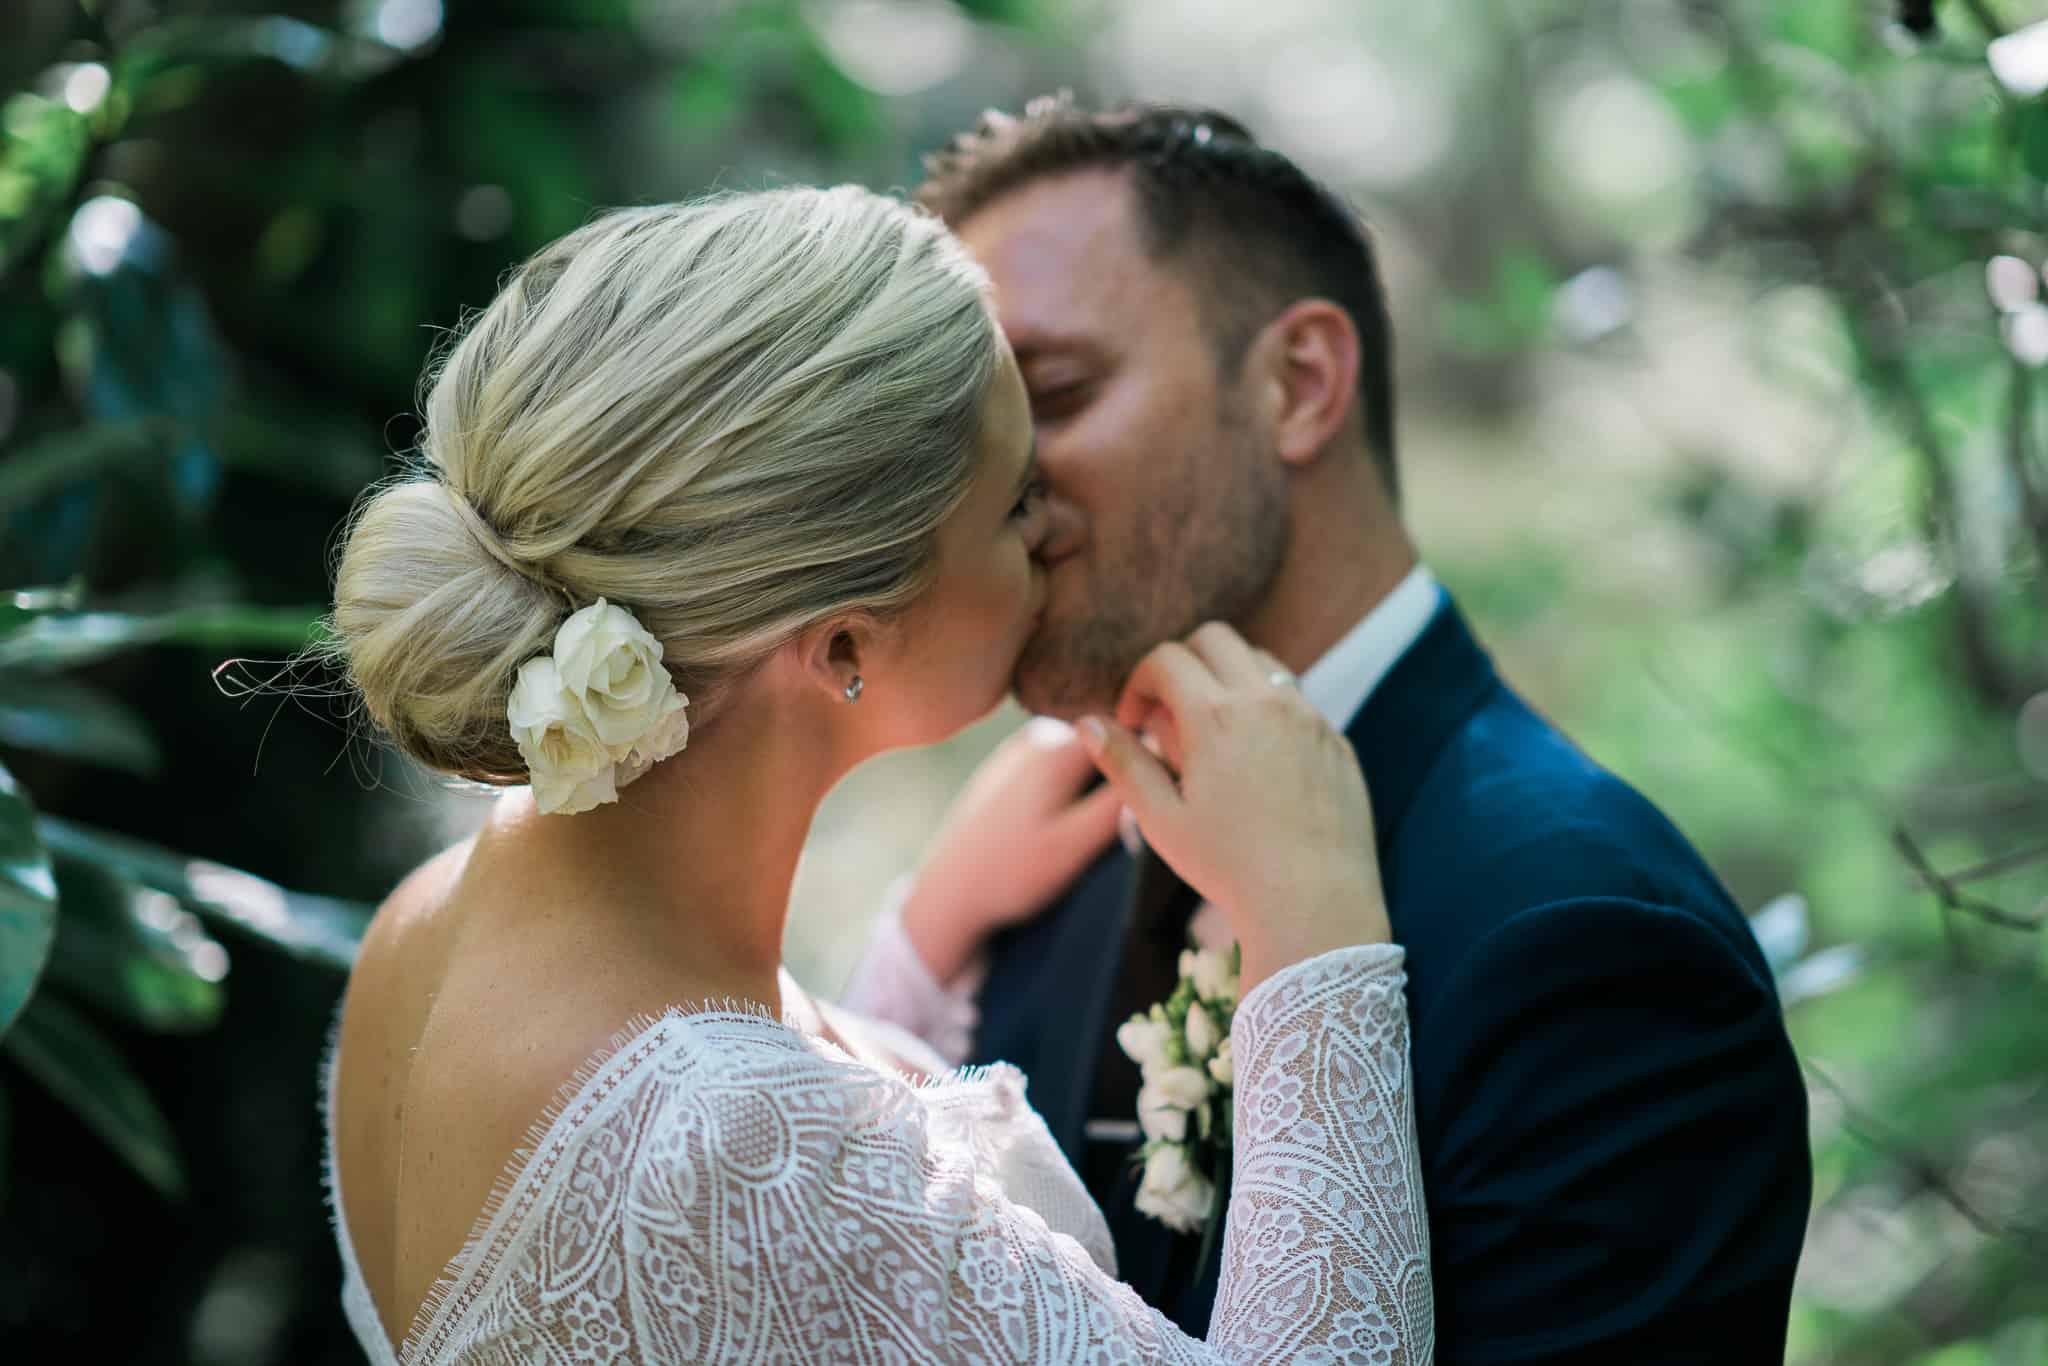 Southern highlands wedding photographer, bowral wedding photographer